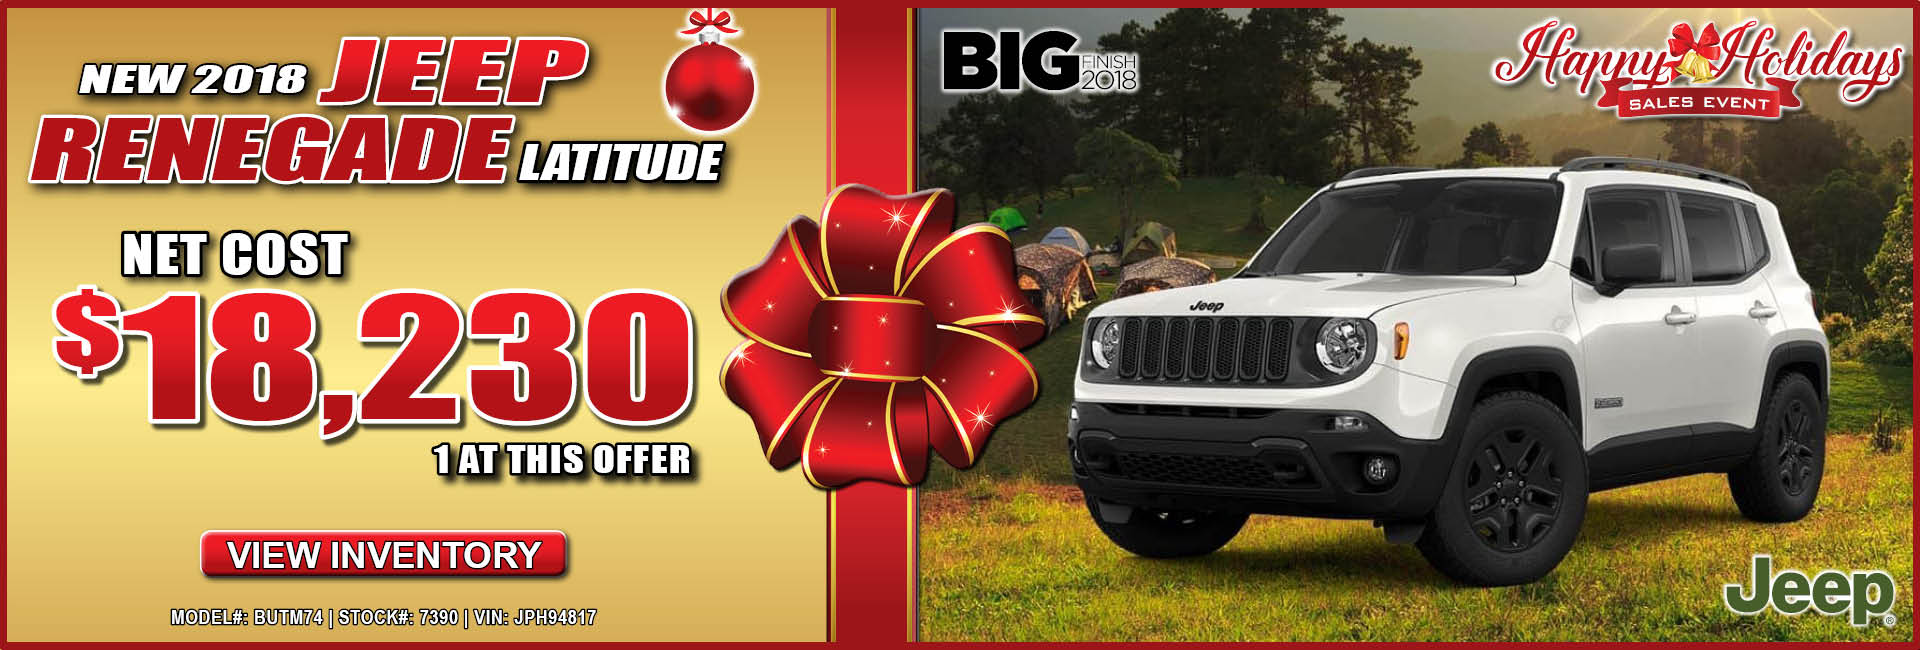 Jeep Renegade $18,230